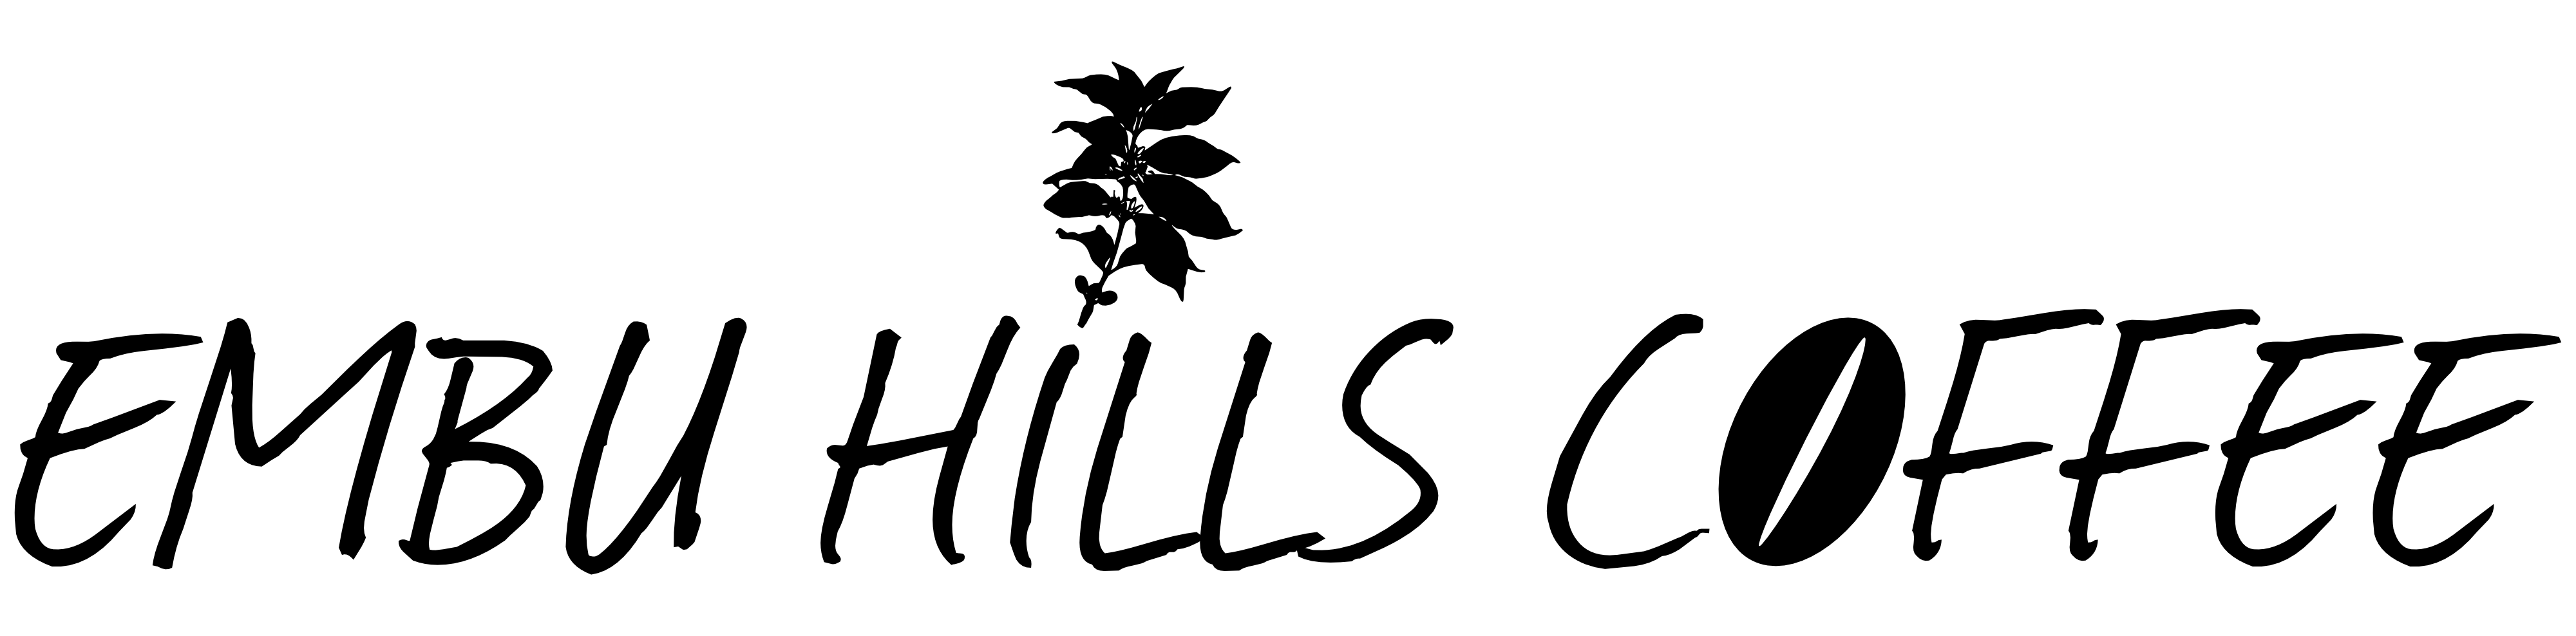 Embu Hills Coffee Logo schwarz